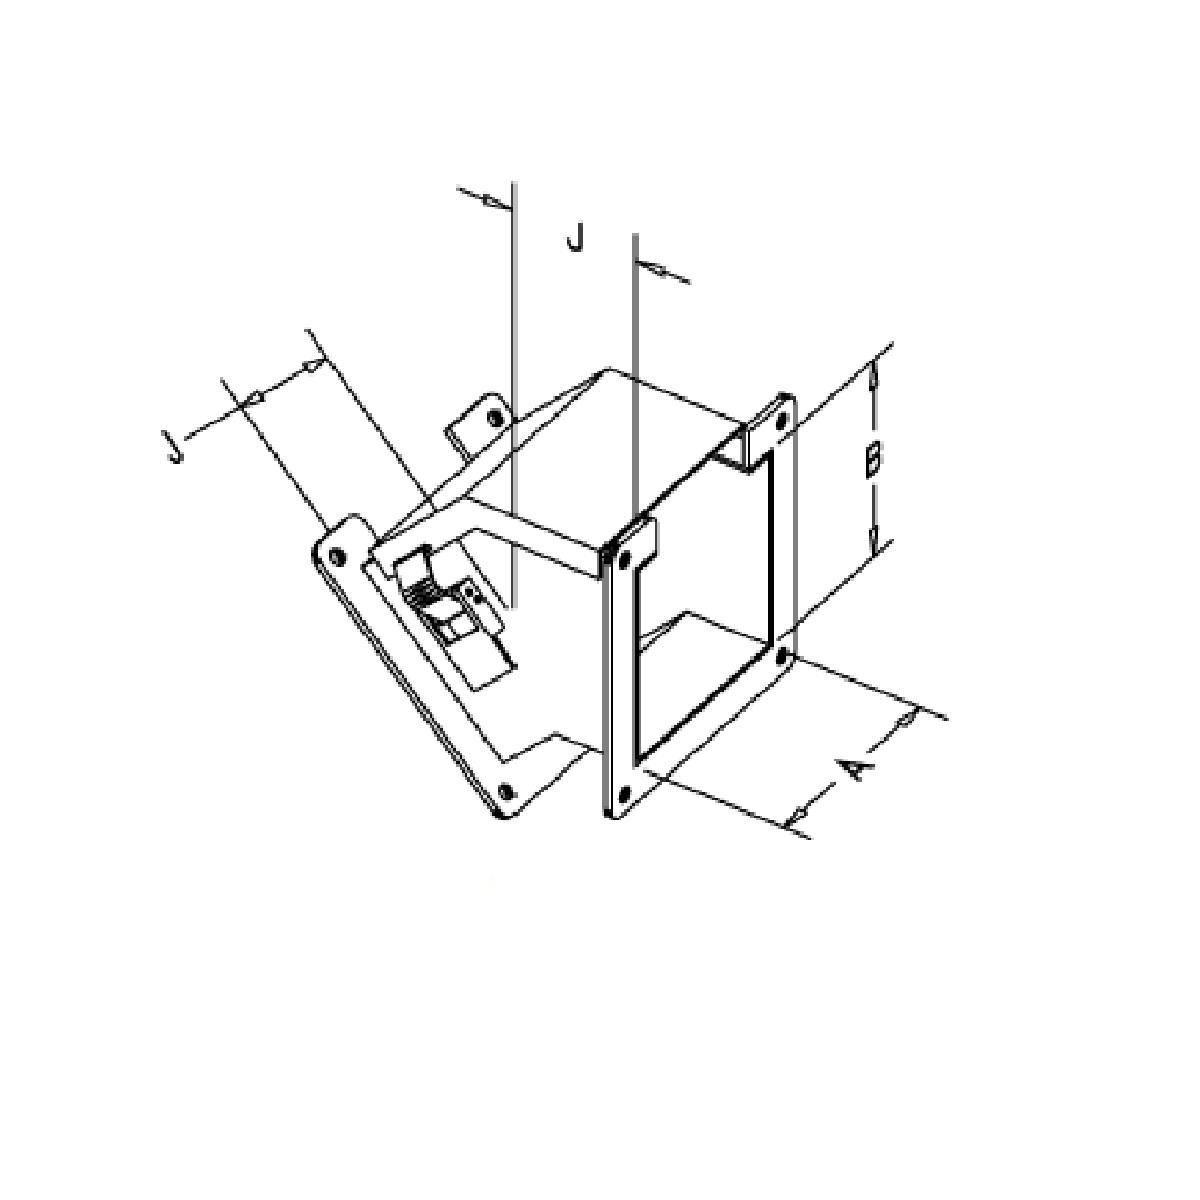 ljwl452c brand hubbell AT&T Phone Wiring Diagram representative image